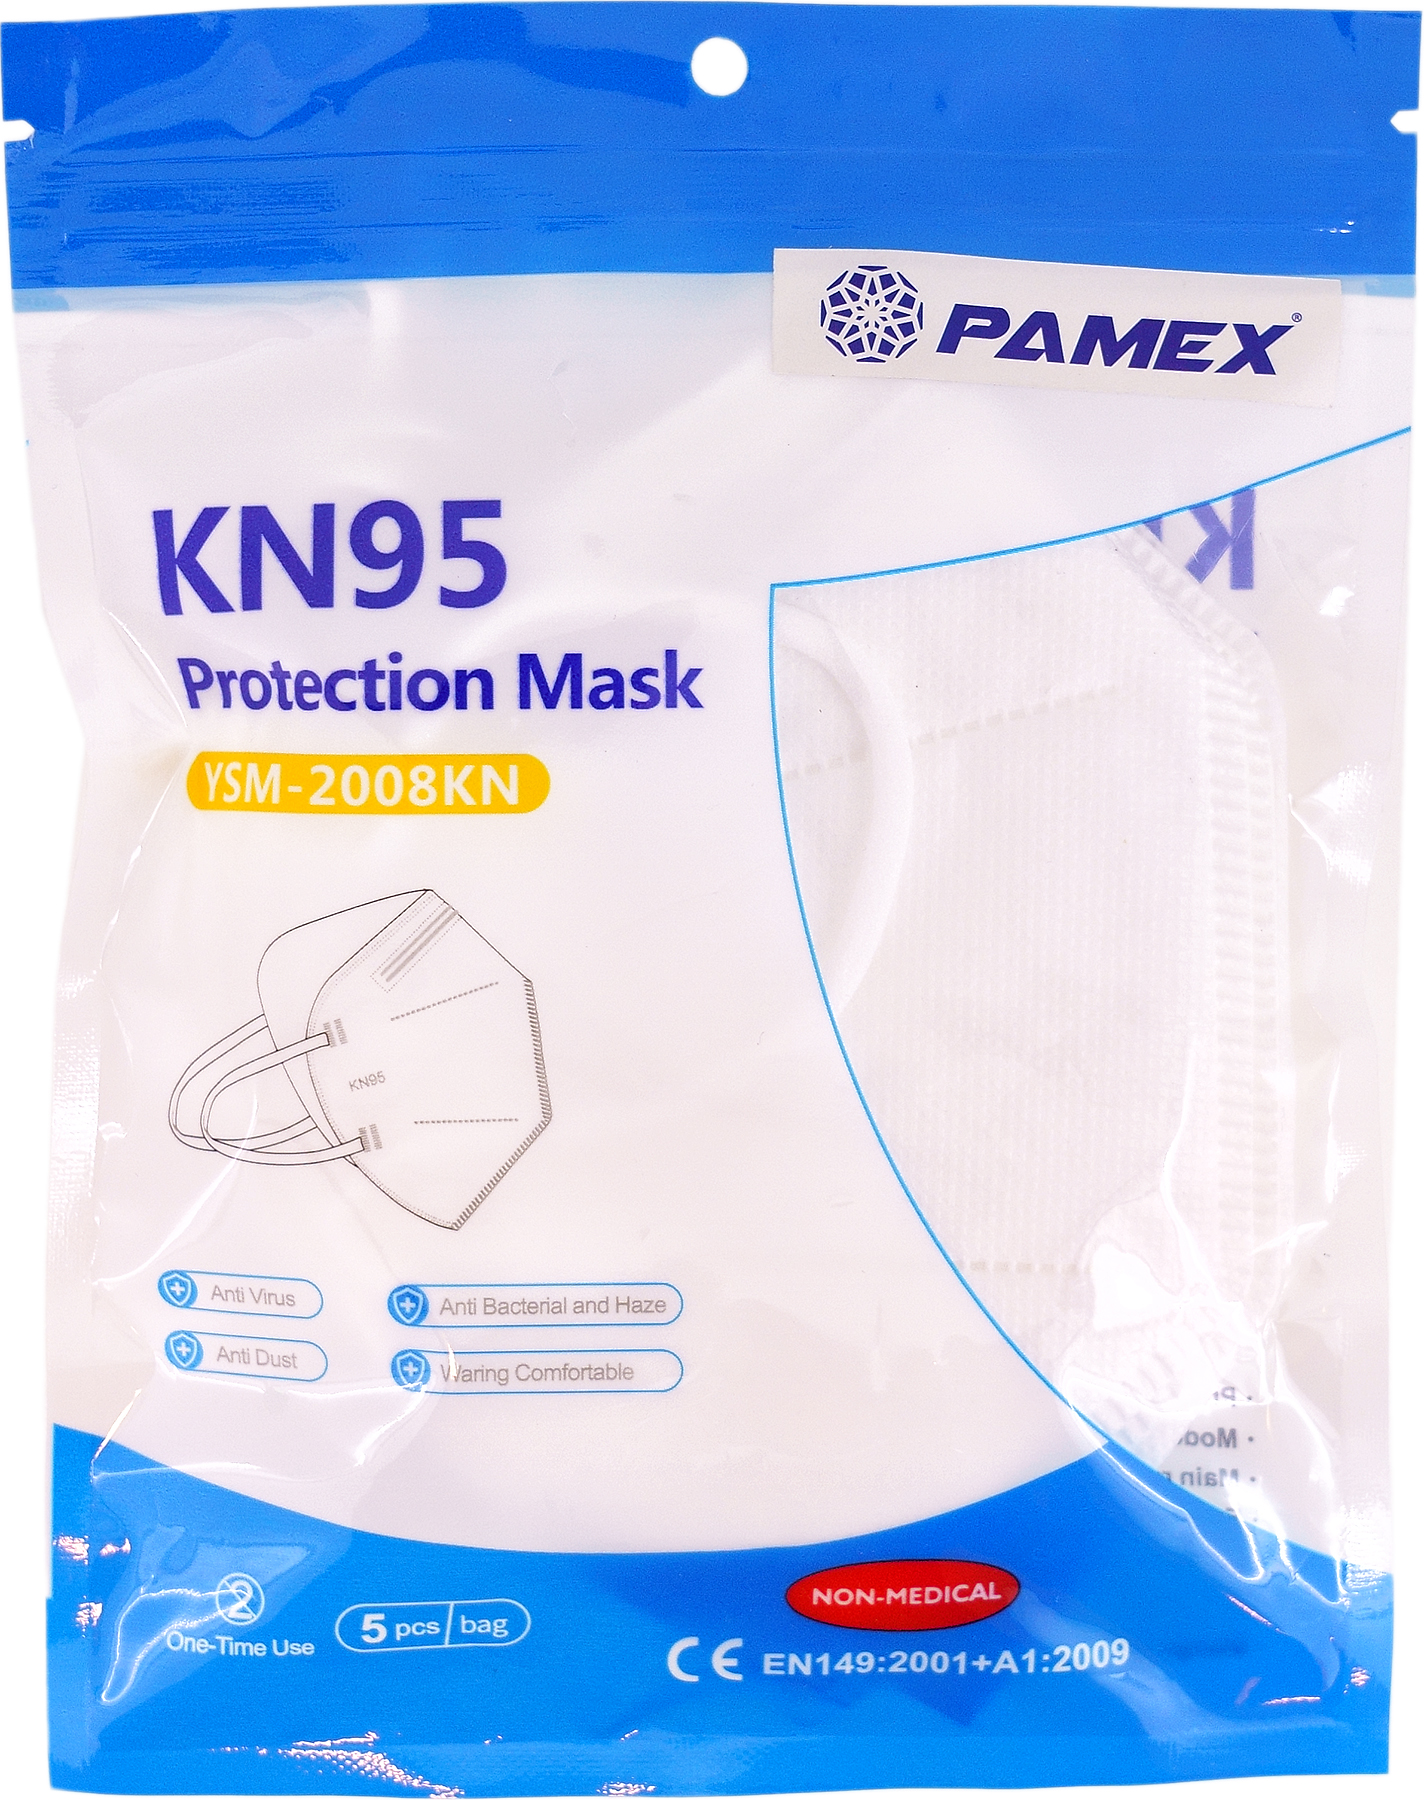 MASCARA PROTECCION PERSONAL KN95 FFP2 5 UNID